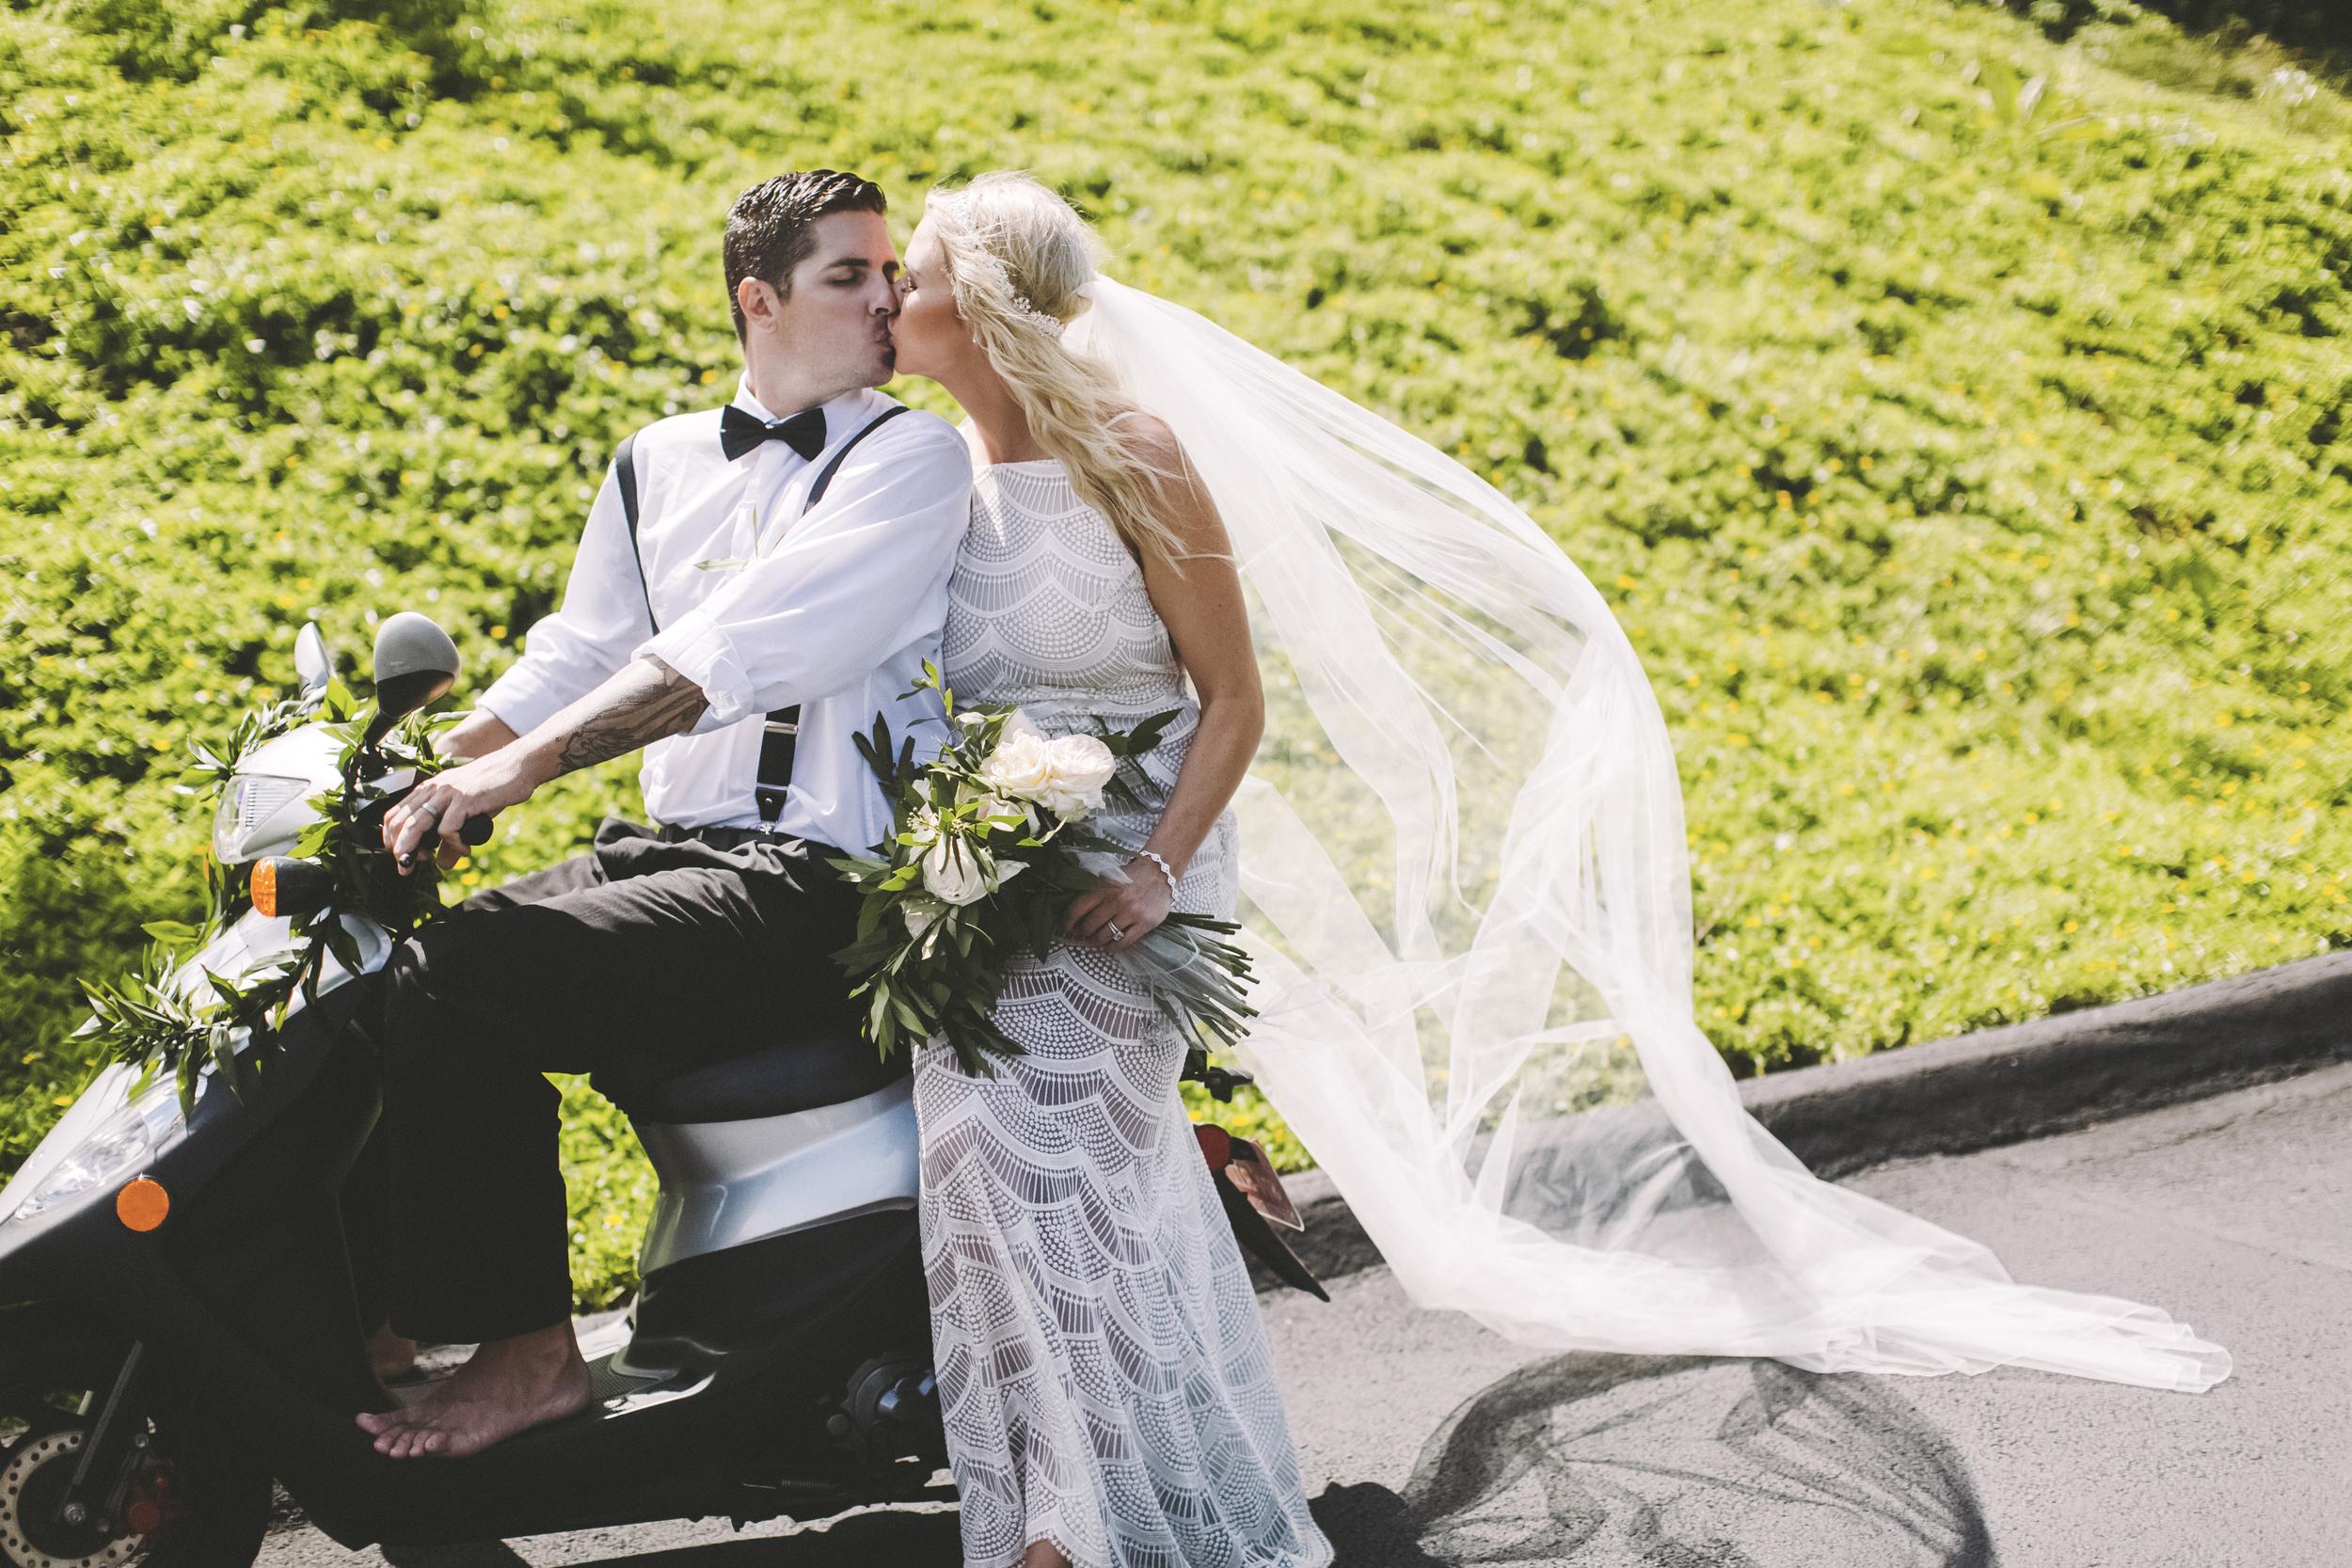 angie-diaz-photography-hawaii-wedding-59.jpg